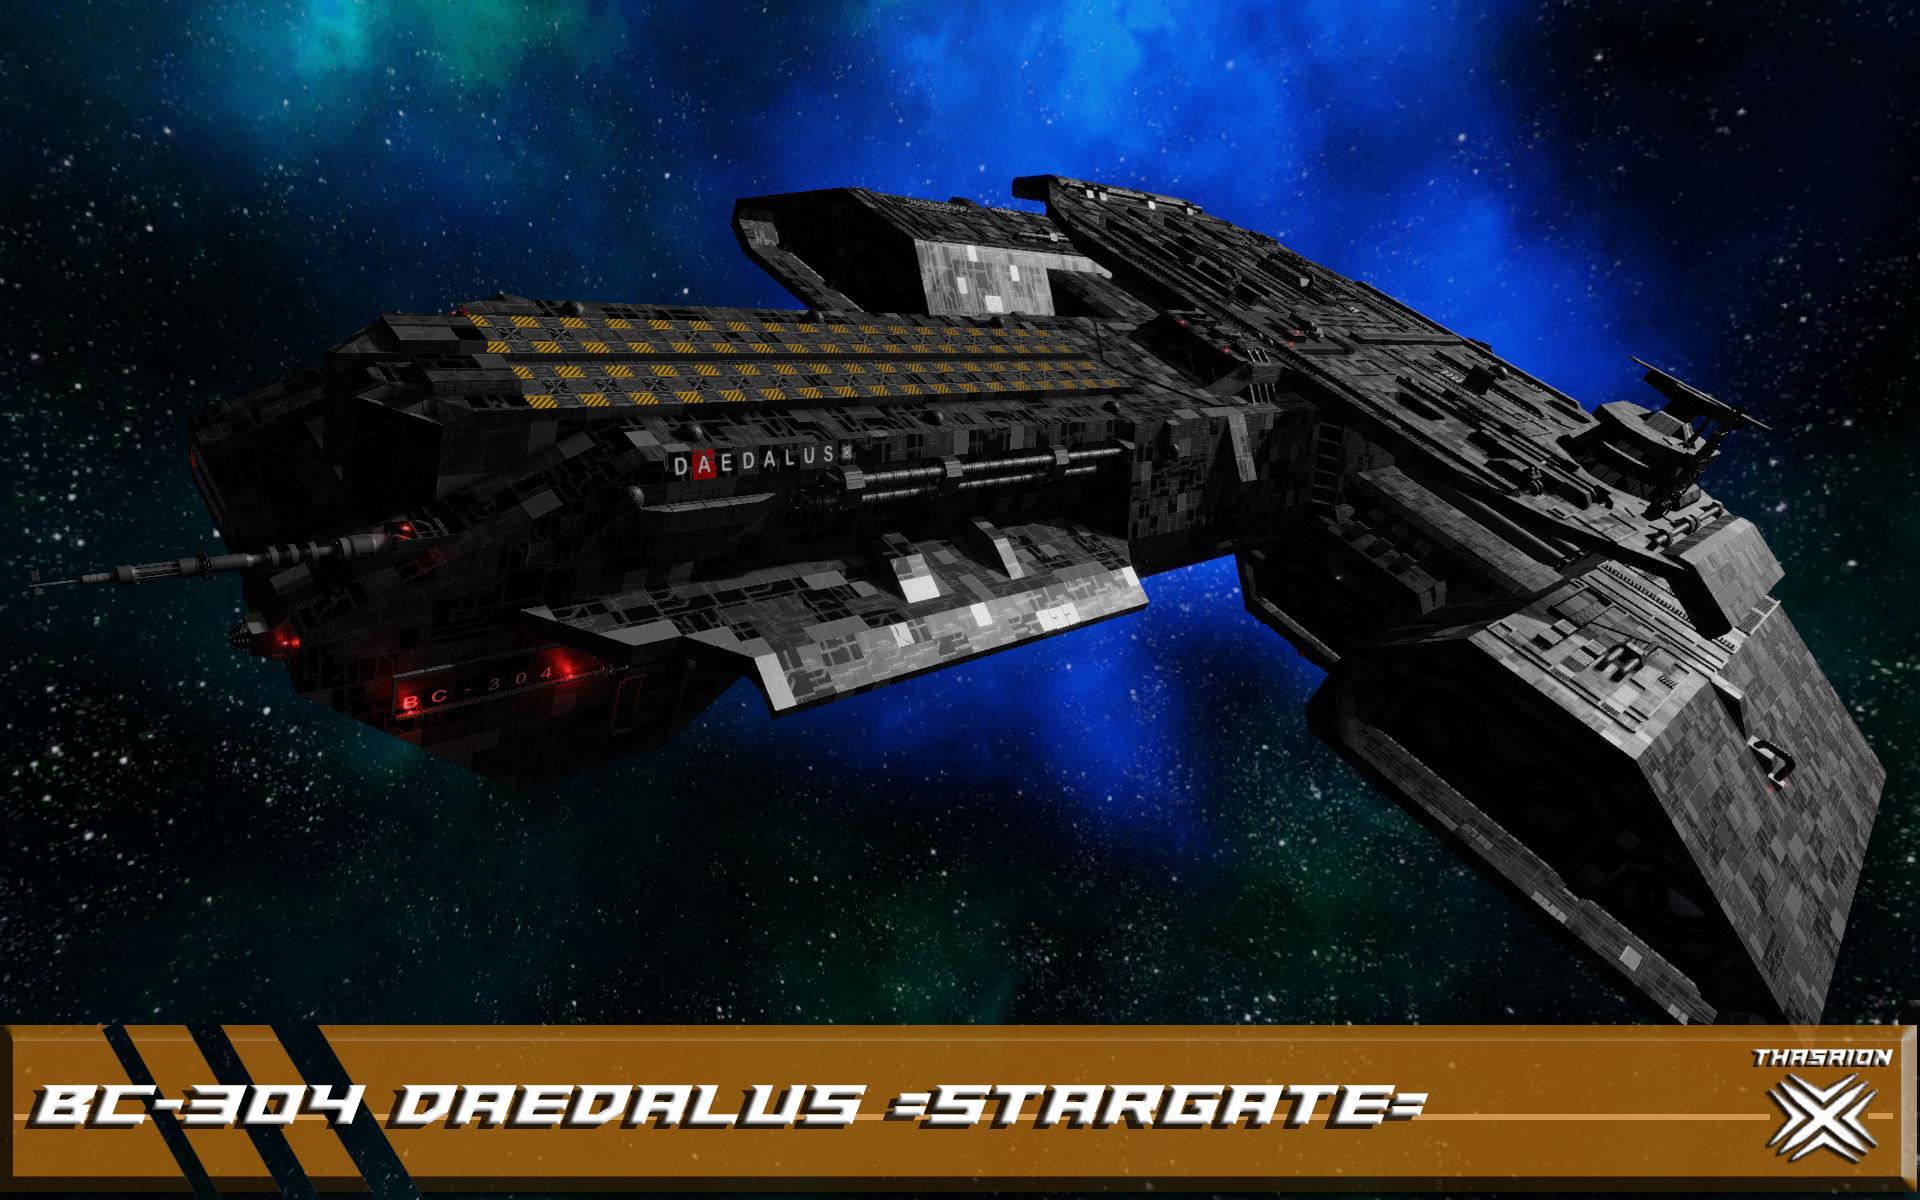 BC-304 Daedalus =Stargate=